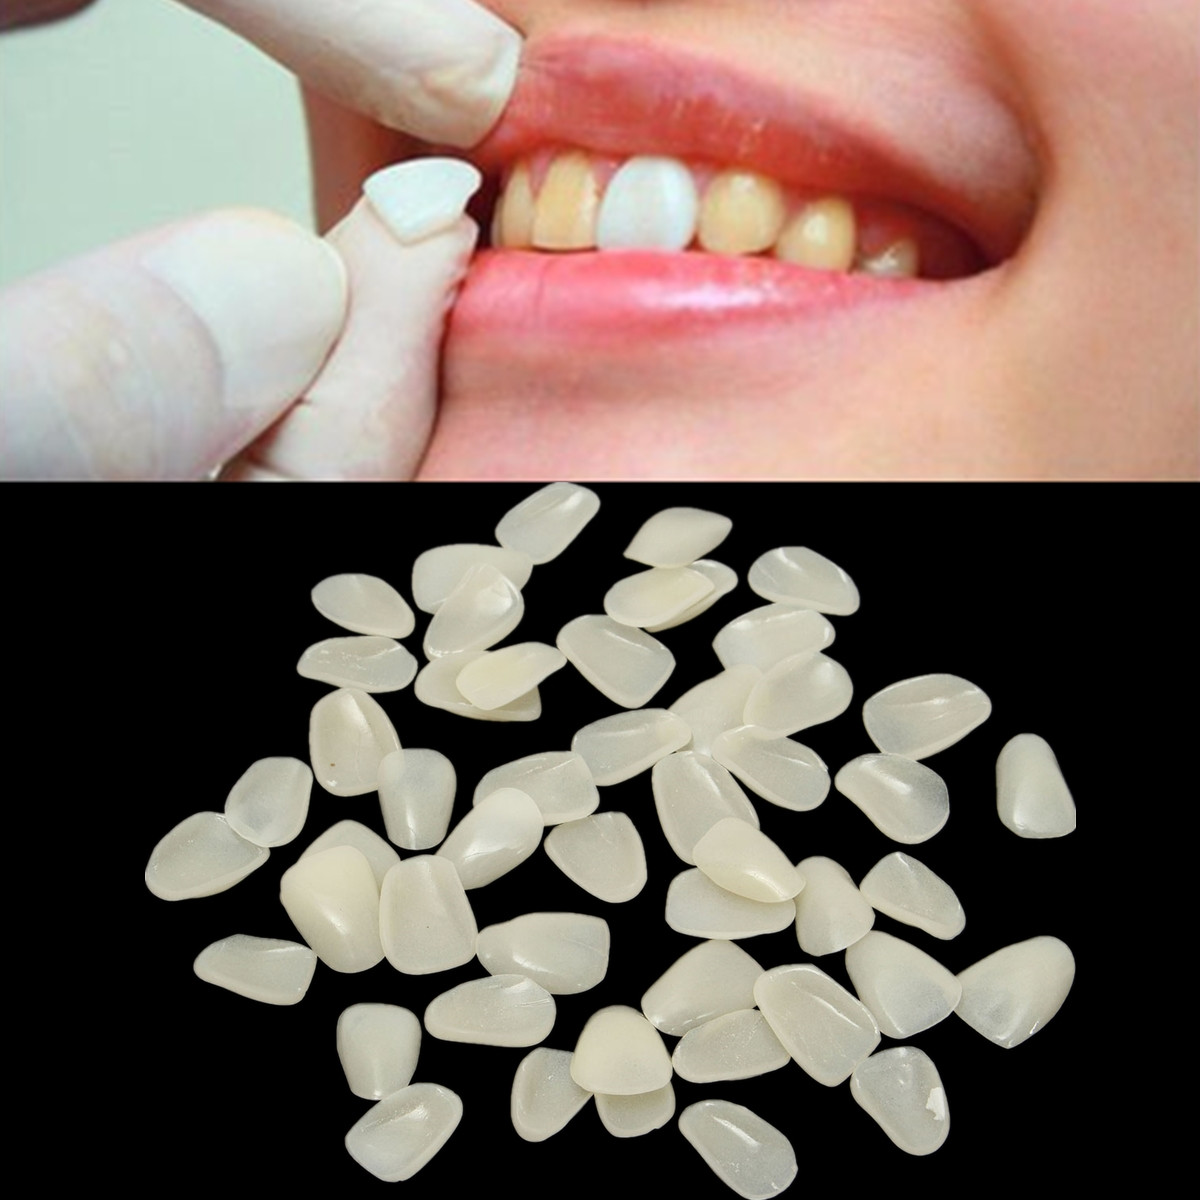 3x50pcs Dental Ultra Thin Whitening Porcelain Teeth Medical Veneers Resin Teeth Anterior Temporary Crown For Dental Care